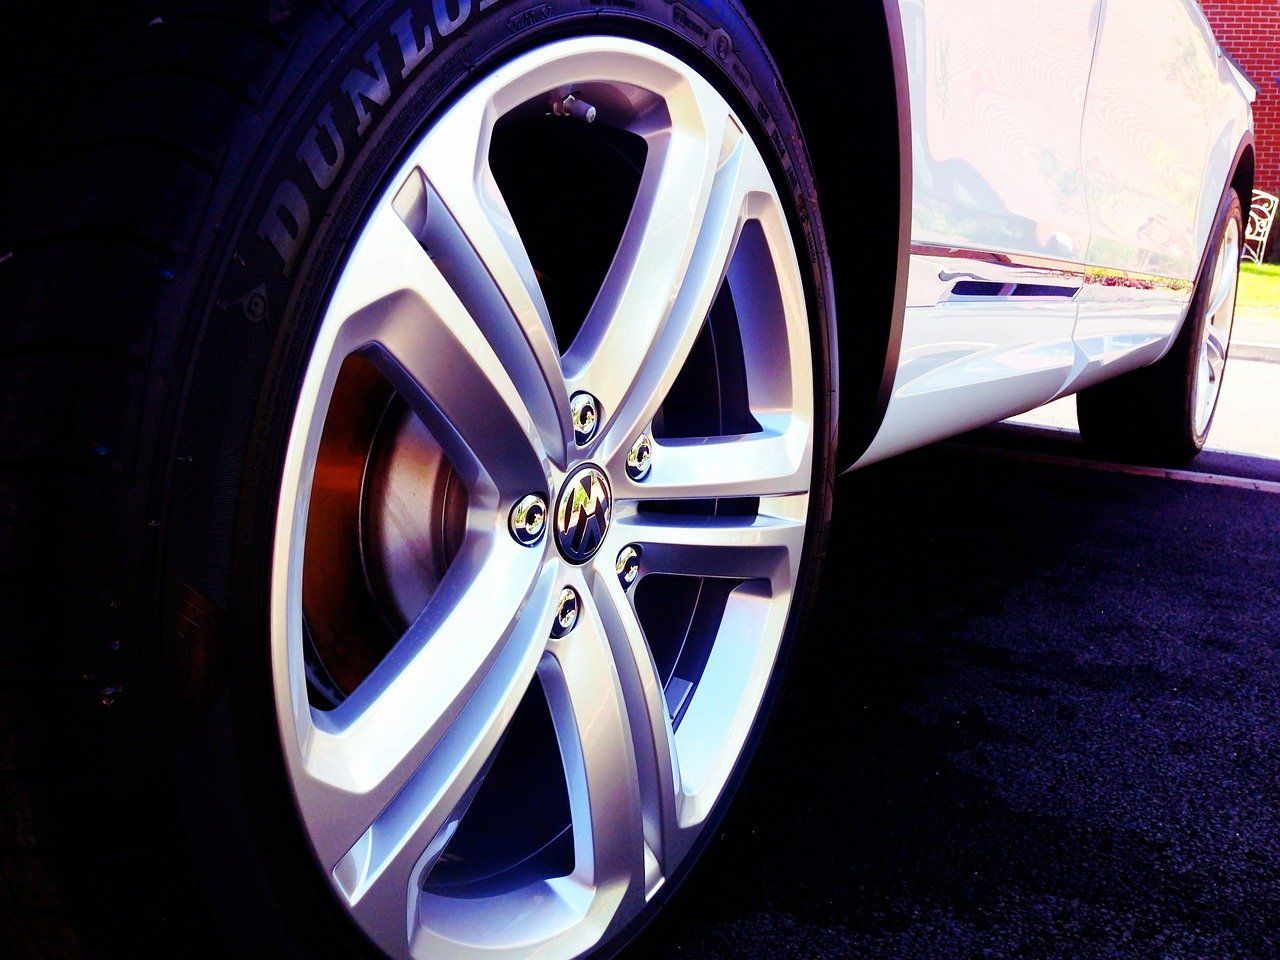 Wheels 1545983 1280